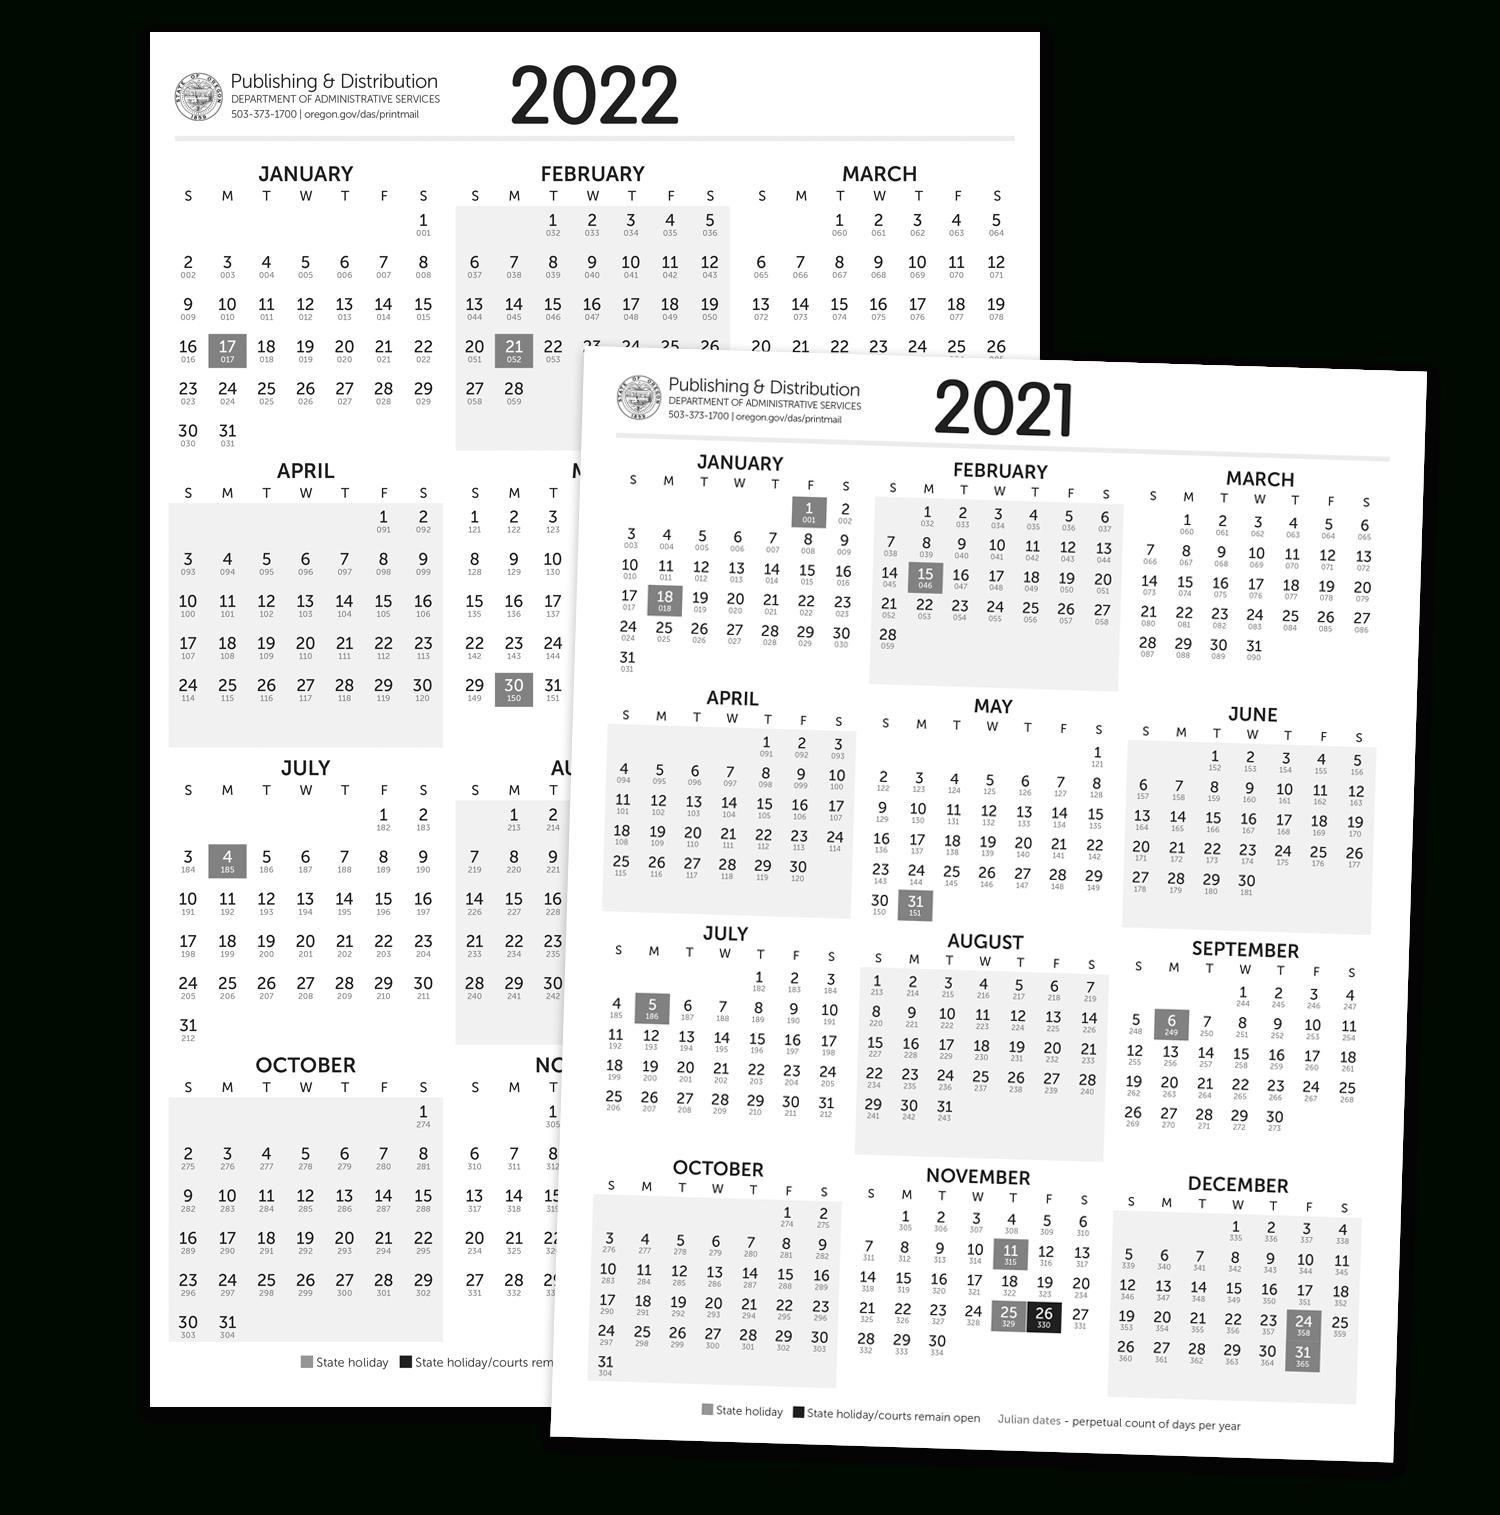 Julian Calendar For Leap Year 2021 | Printable Calendar